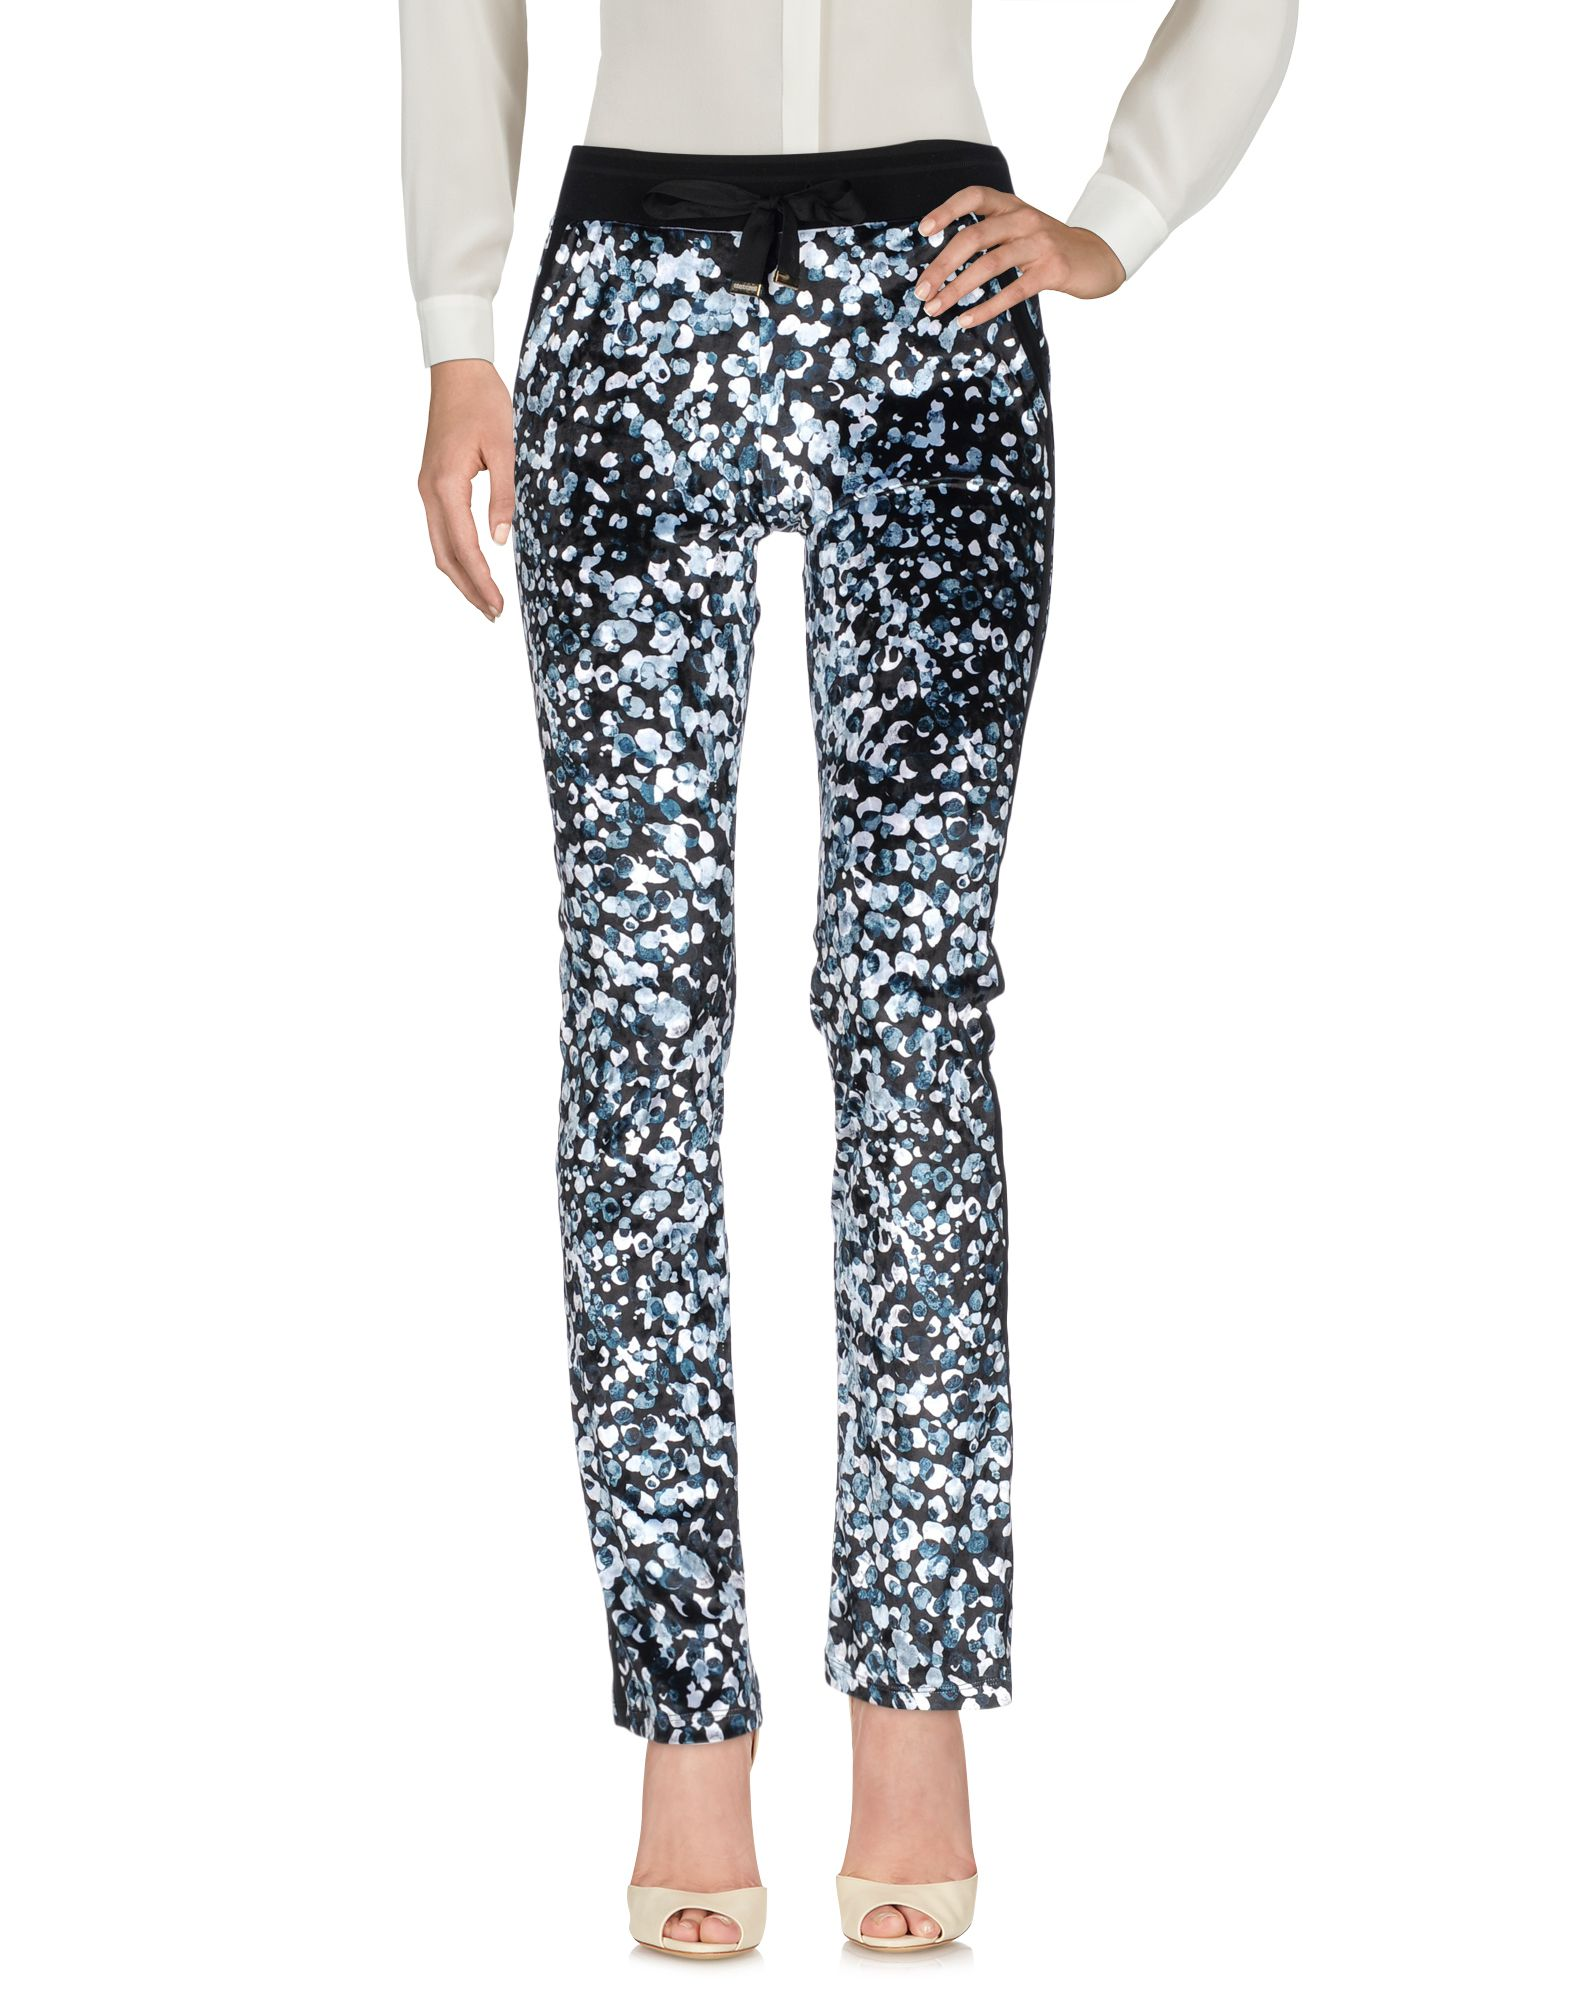 Pantalone Roberto Cavalli Gym Donna - Acquista online su DnlANdnU